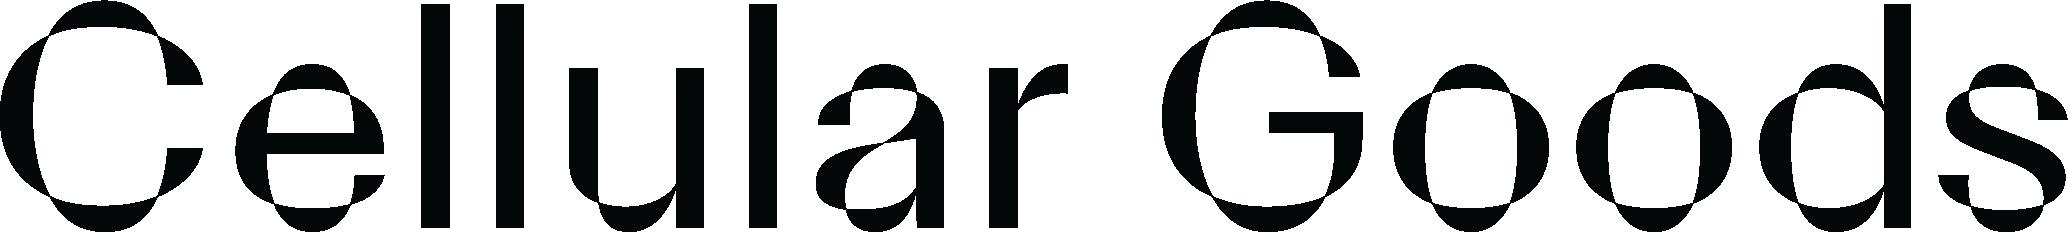 CELLULAR GOODS PLC Logo